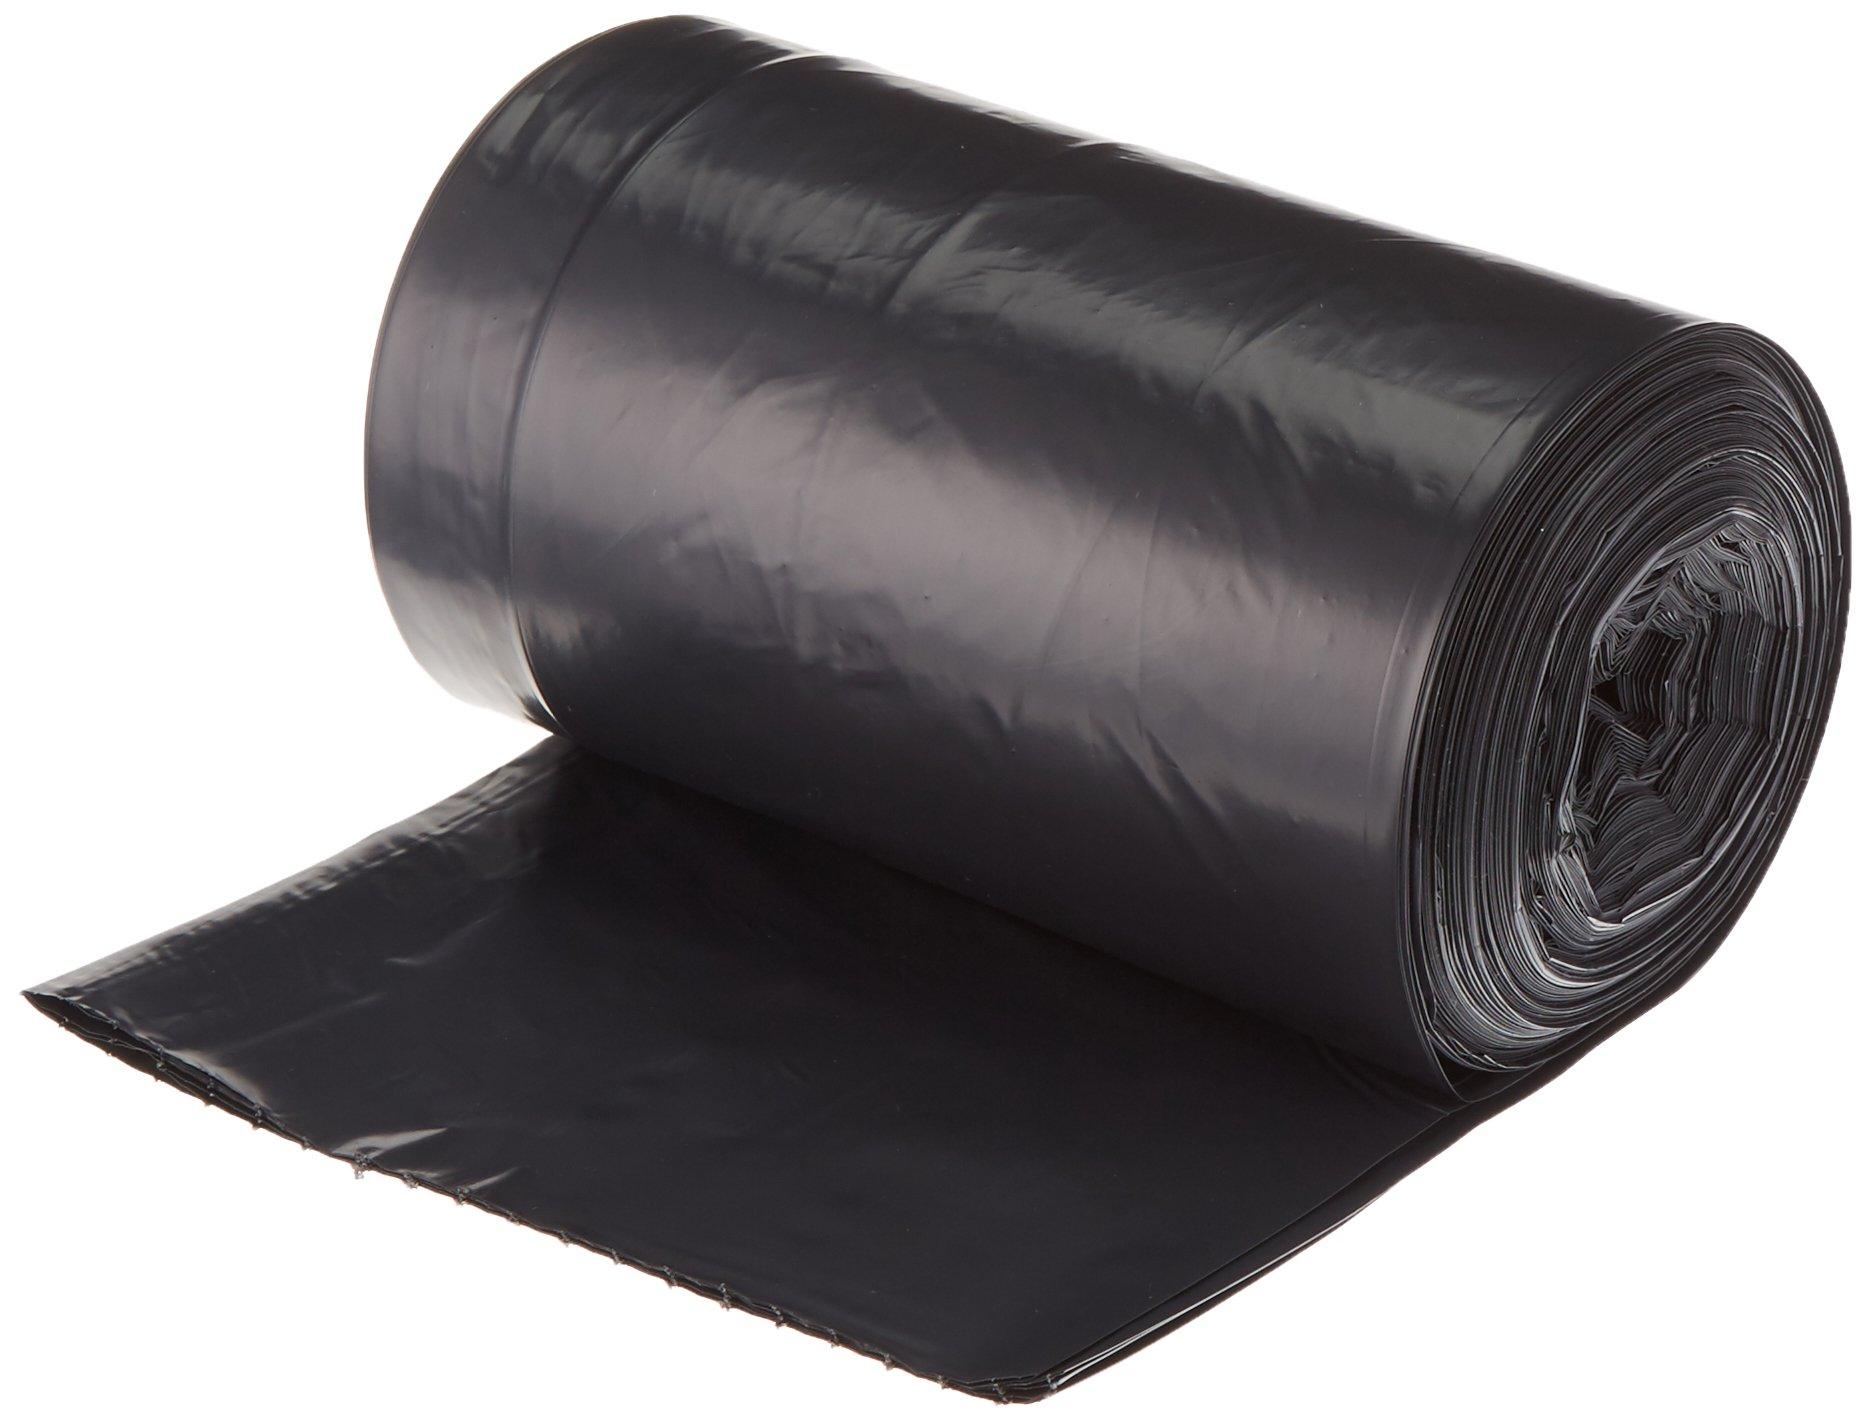 AmazonBasics 23 Gallon Slim Trash Can Liner, 1.6 mil, Black, 250-Count by AmazonBasics (Image #2)